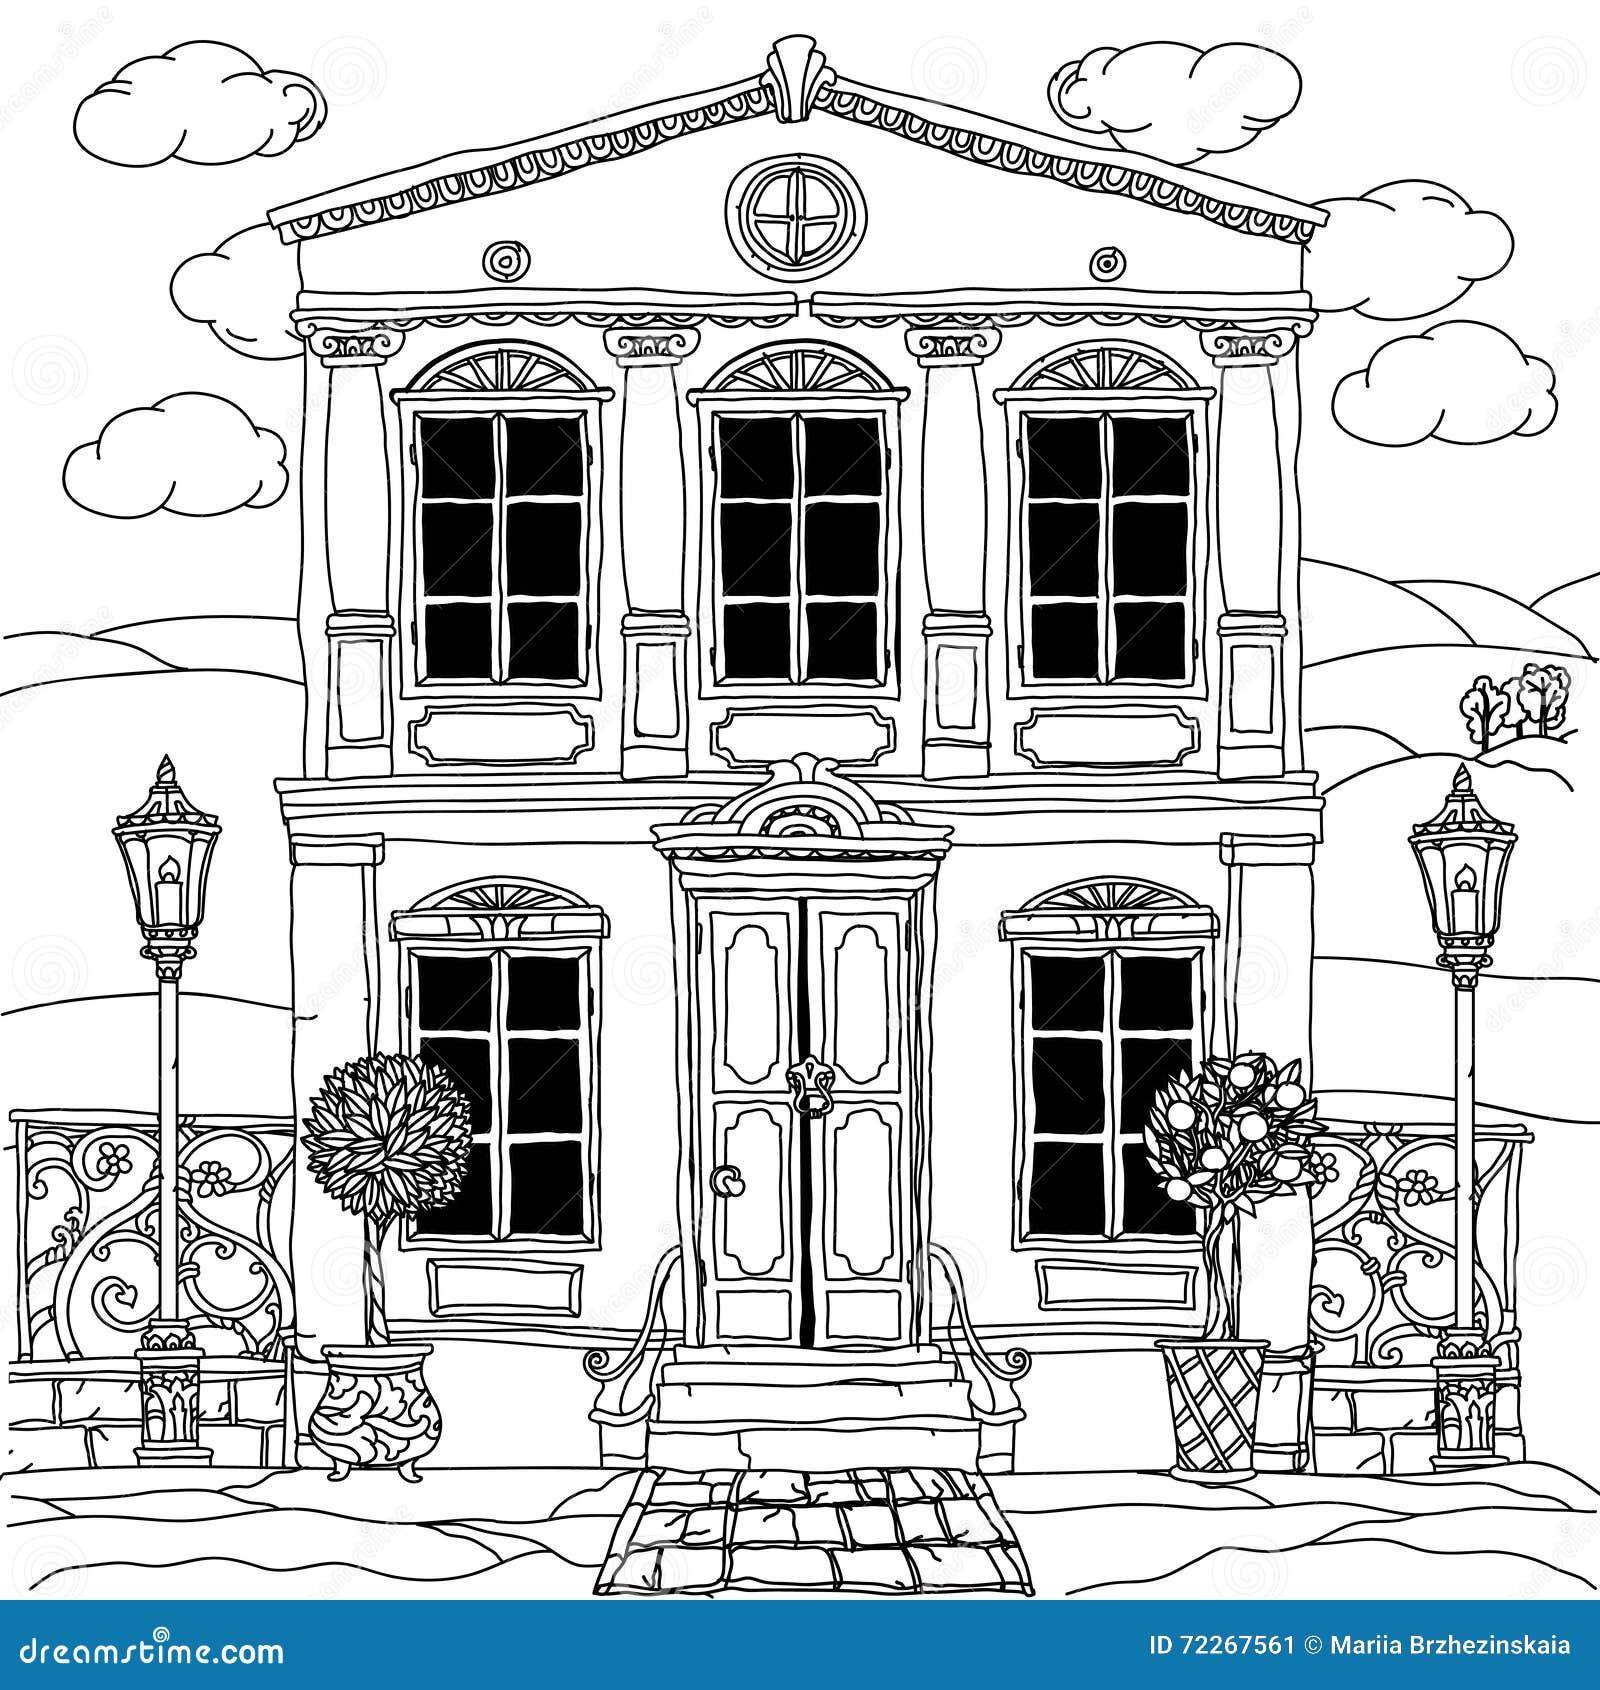 Zen colouring advanced art therapy collector edition - Zen Colouring Advanced Art Therapy Collector Edition 6